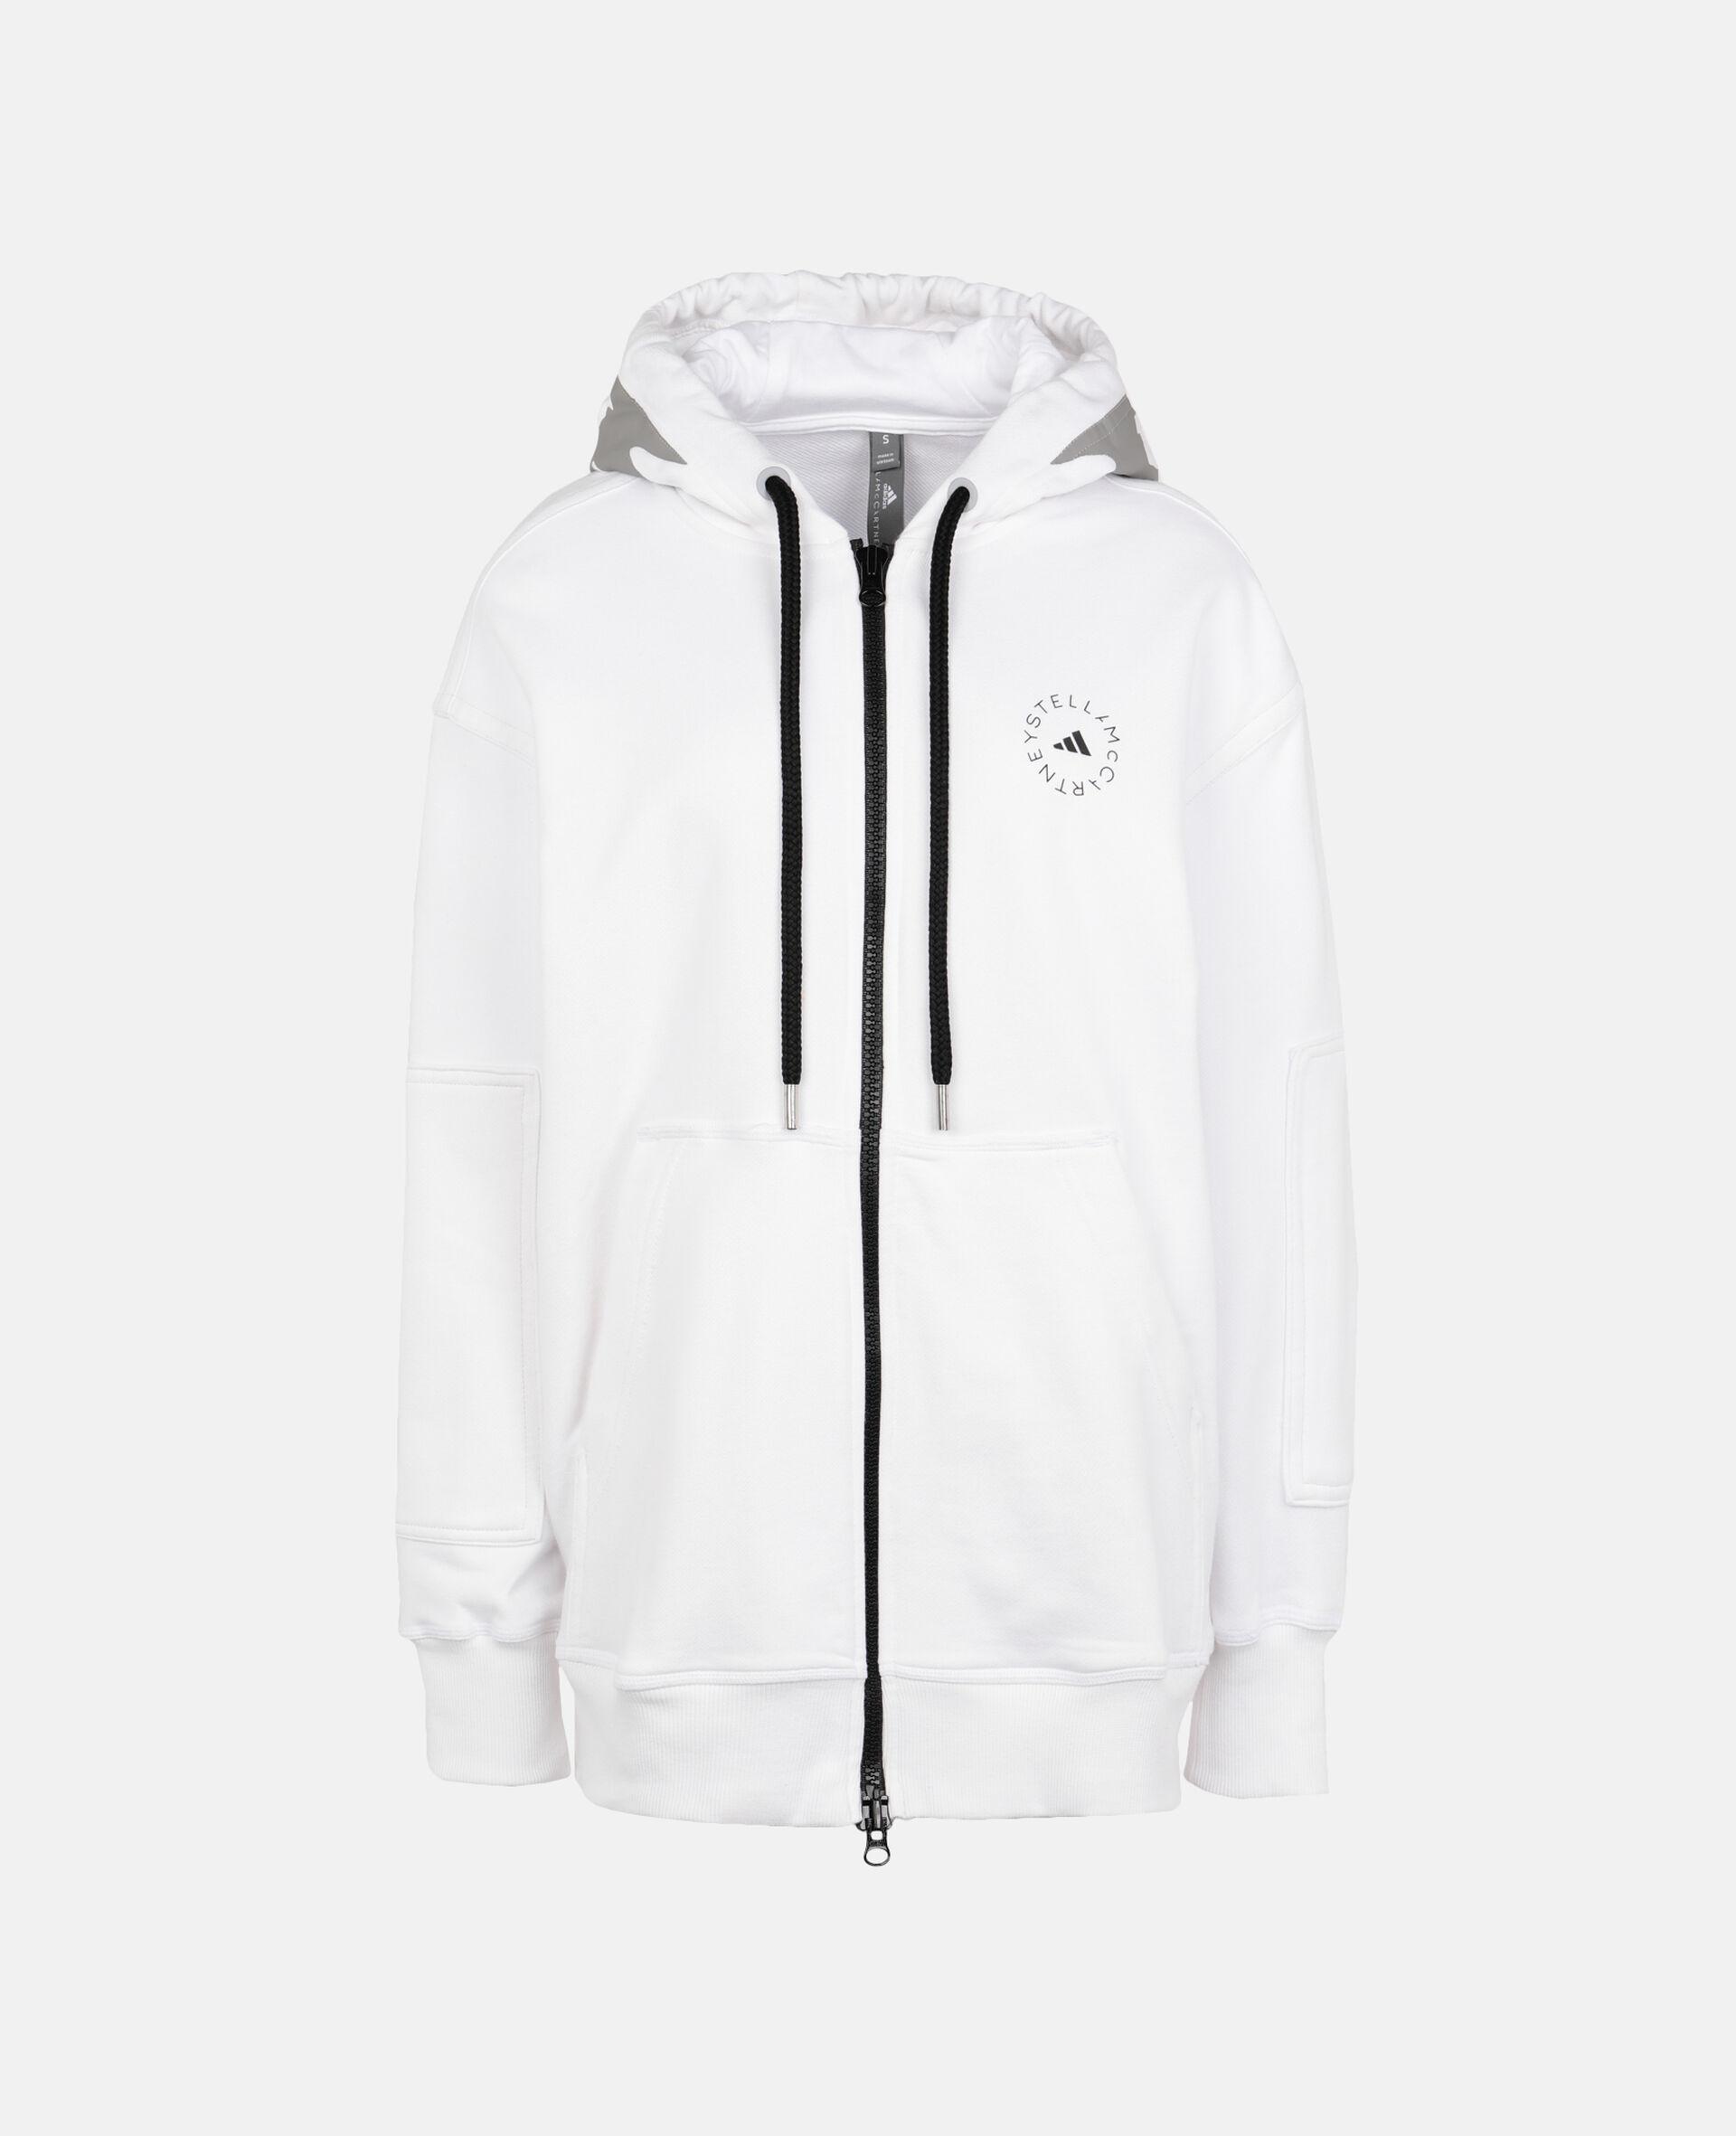 White Full-zip Hoodie-White-large image number 0